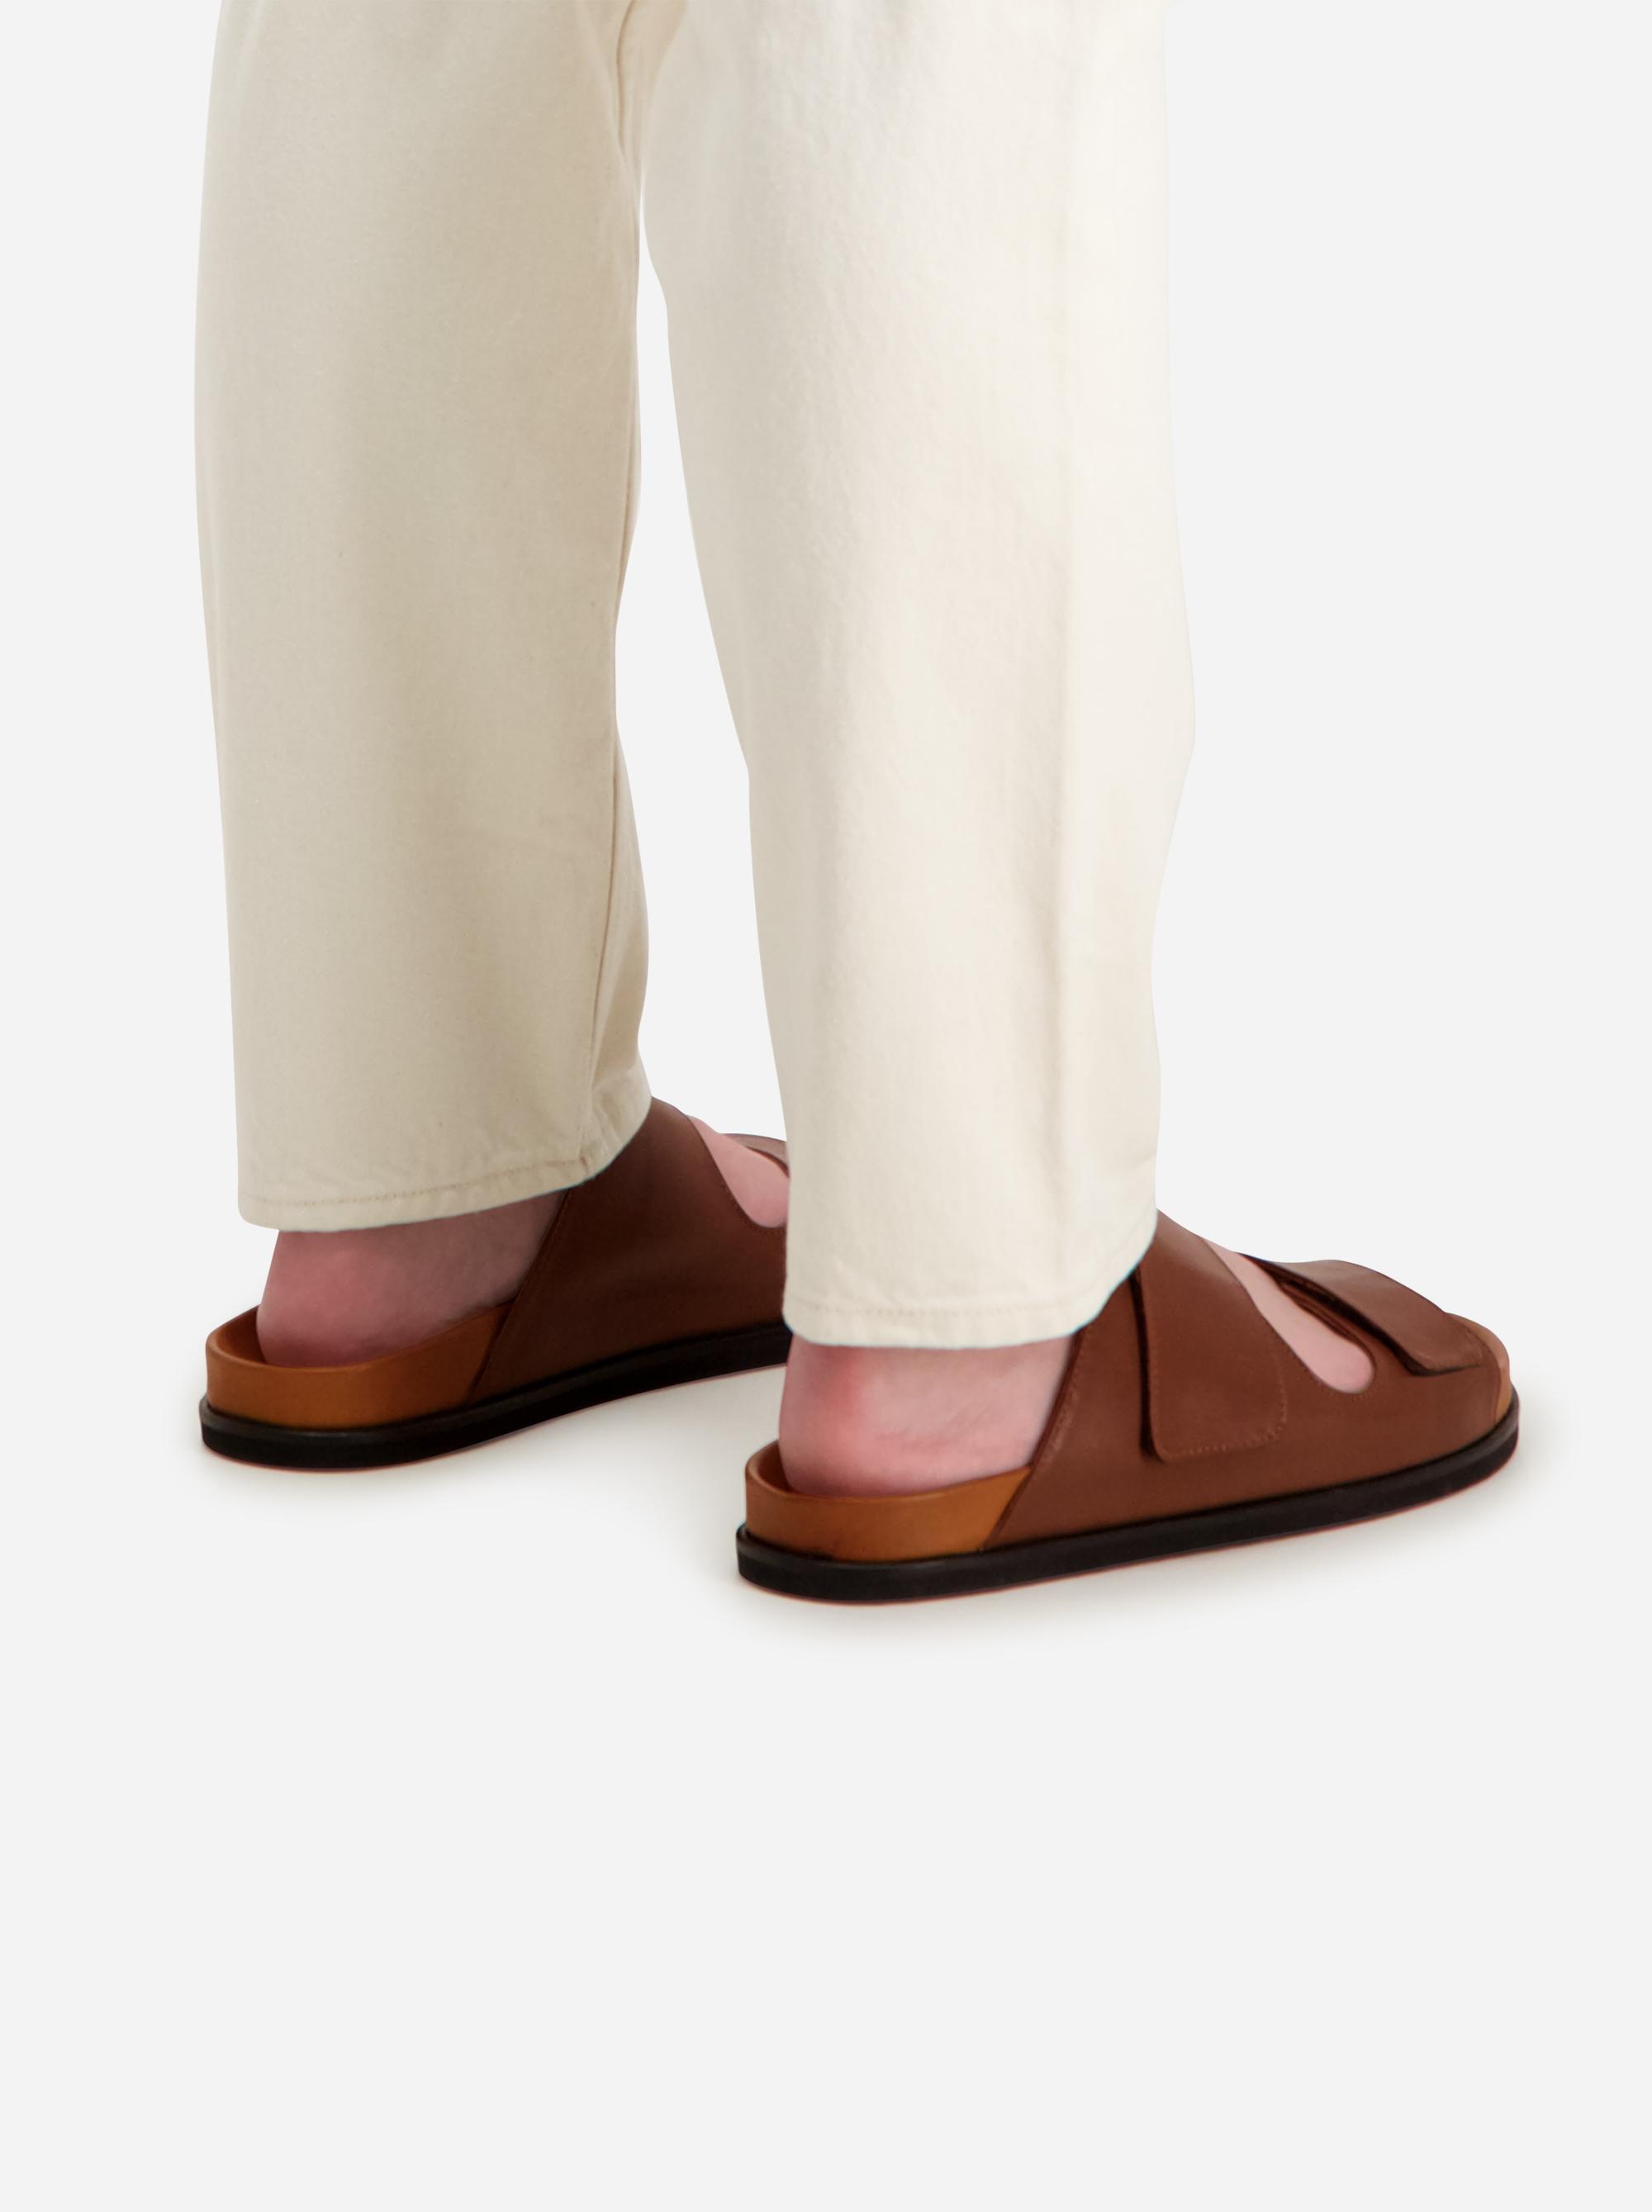 Teym - The Sandal - Men - Brown - 2